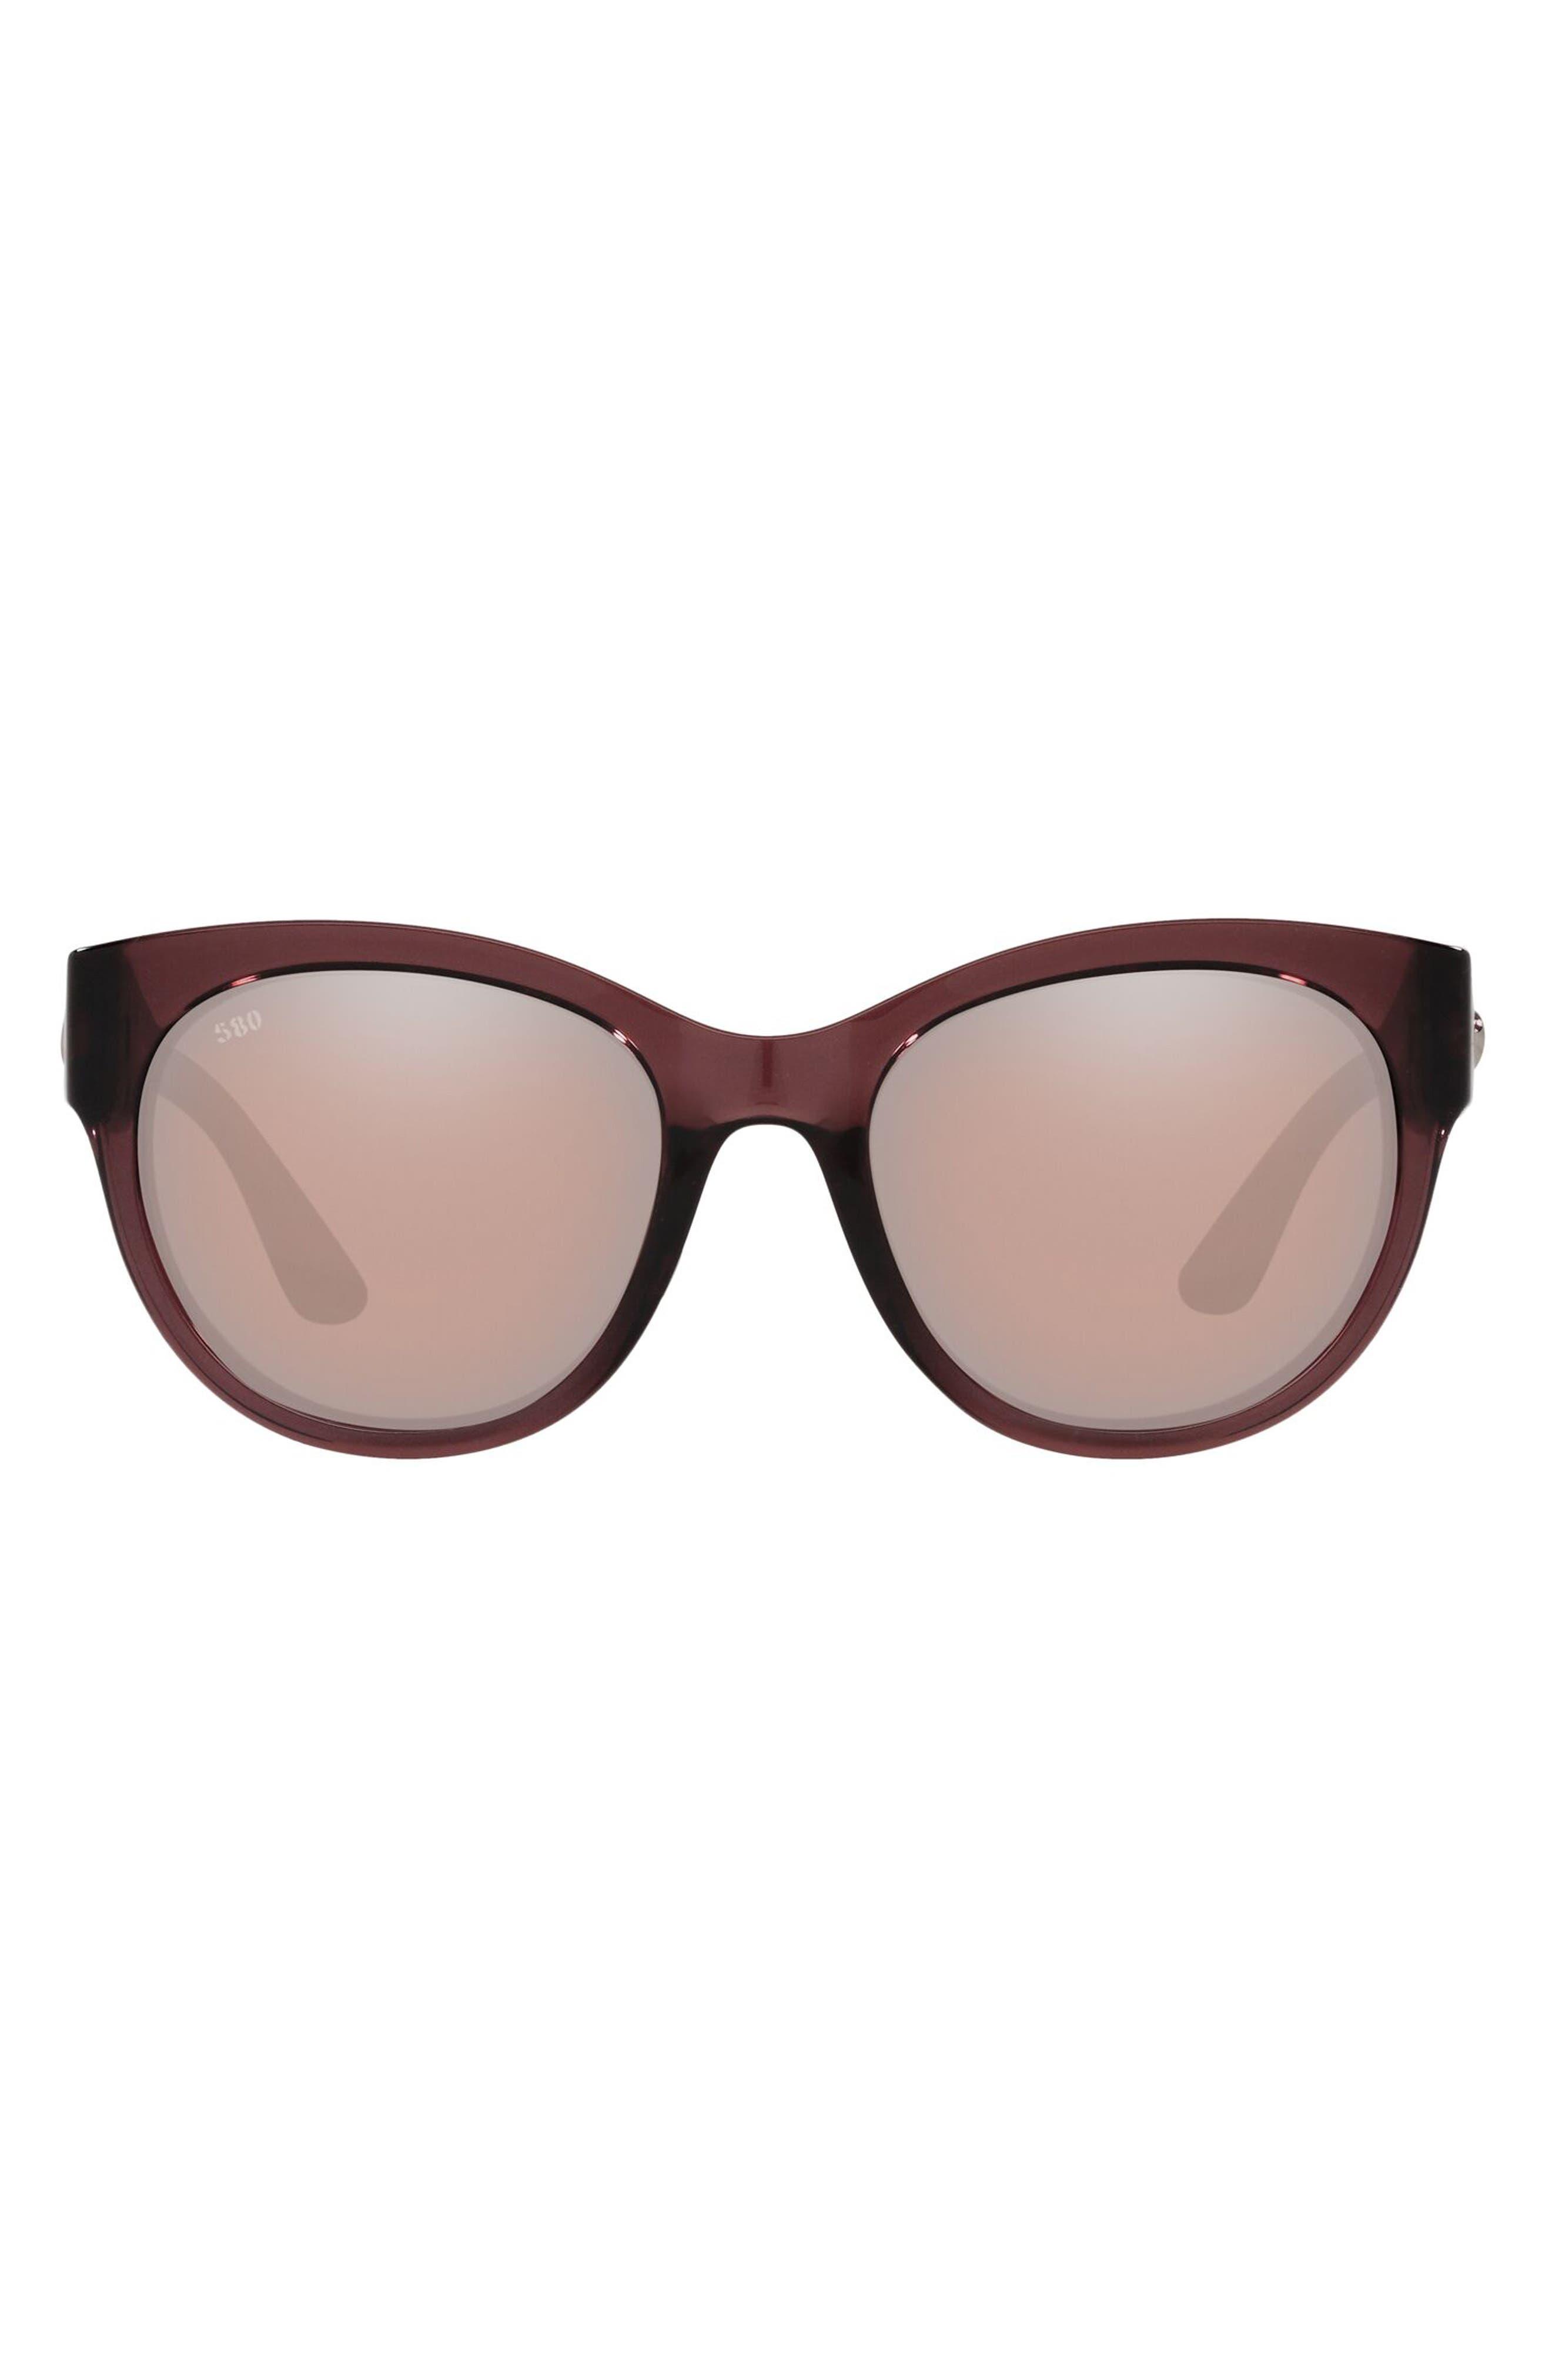 Women's Coasta Del Mar Maya 55mm Polarized Cat Eye Sunglasses